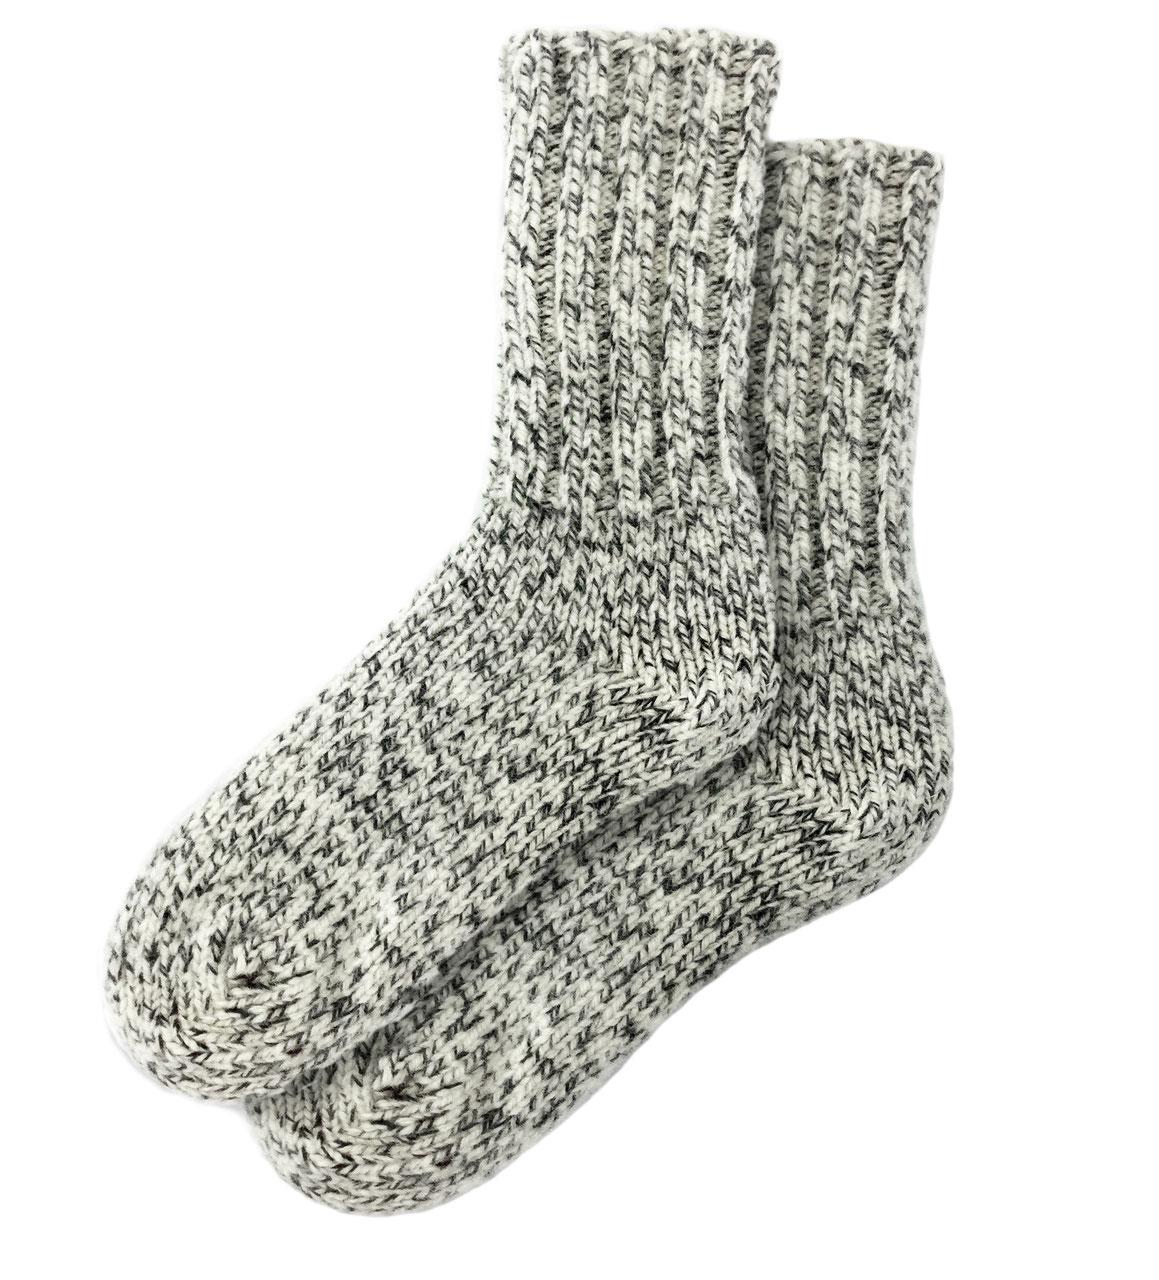 Organic Natural Socks